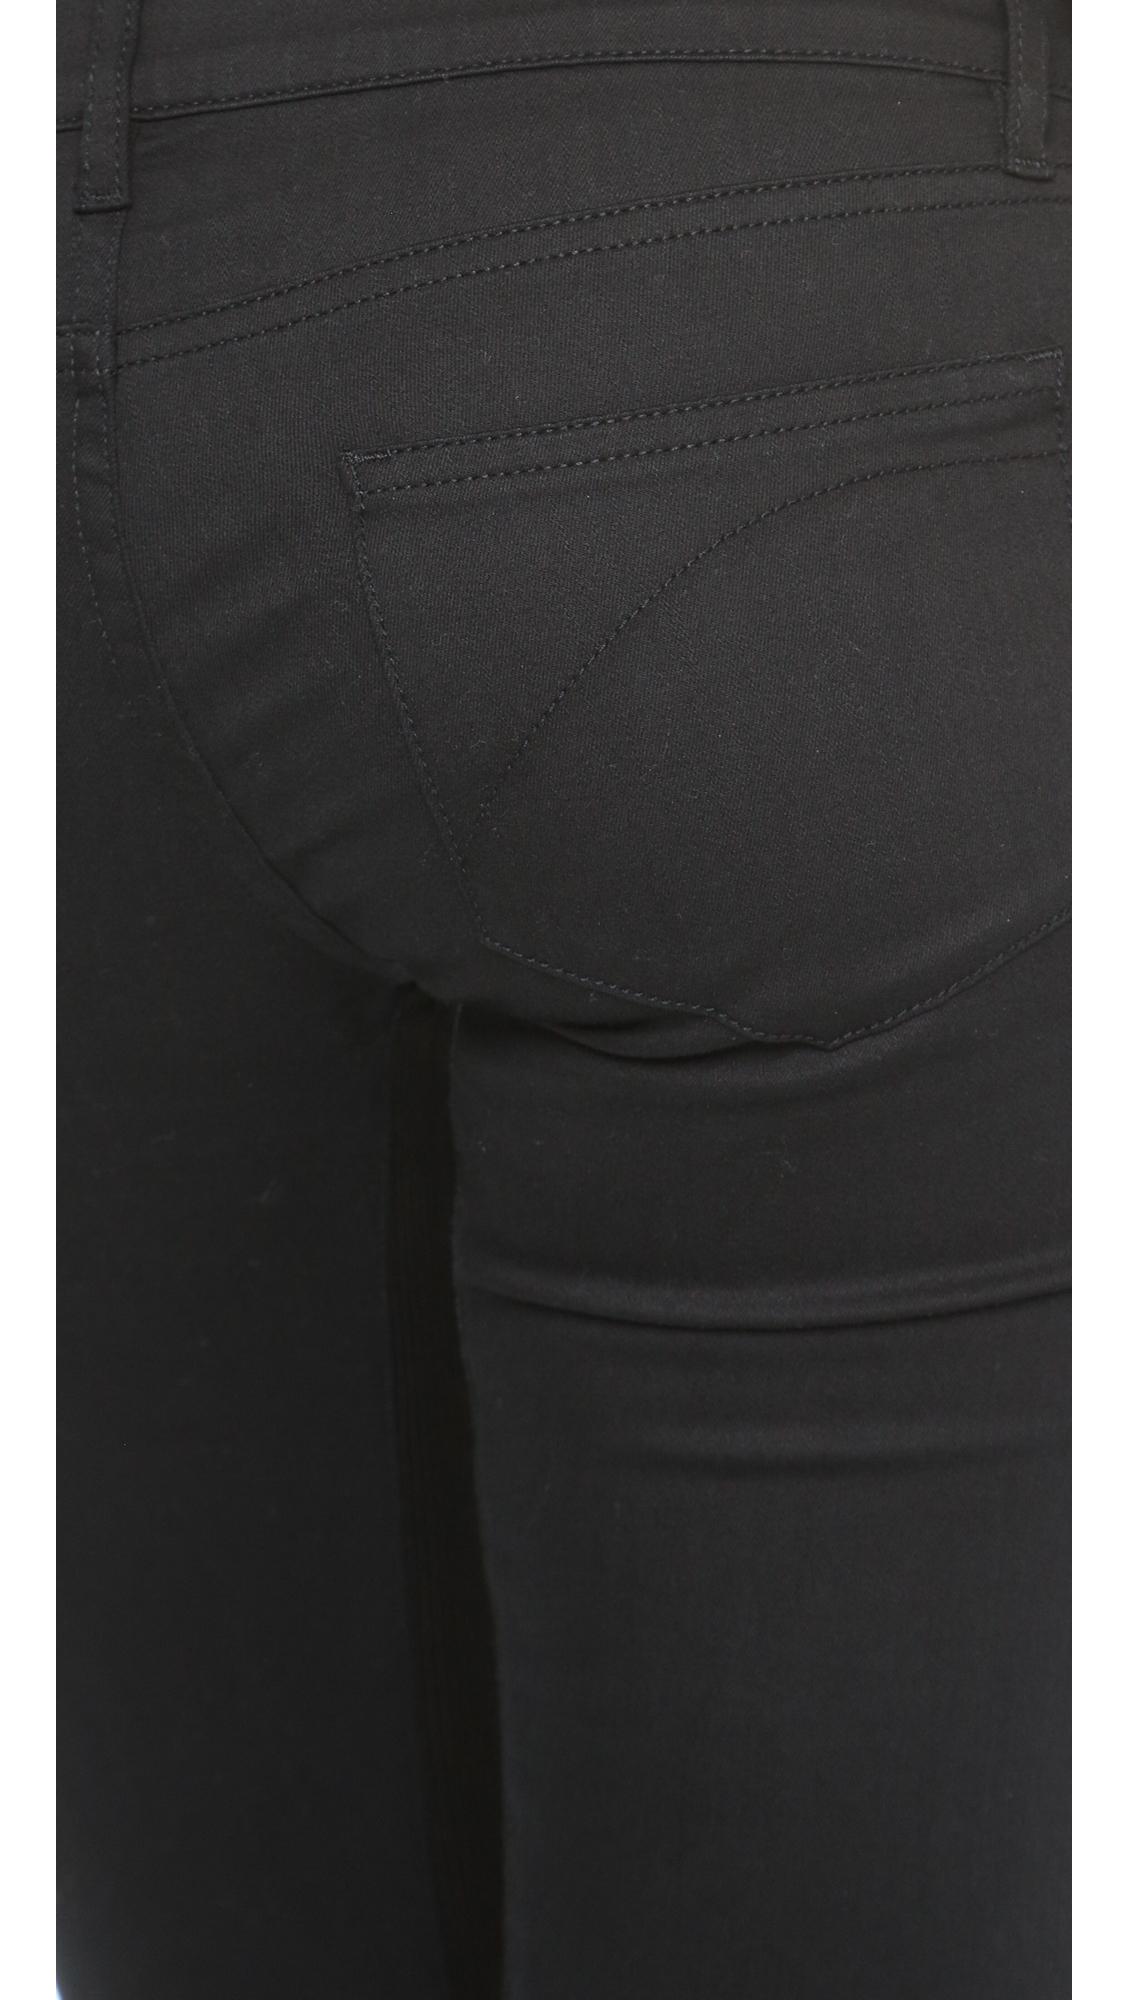 Superfine Denim Legging Jeans - Black